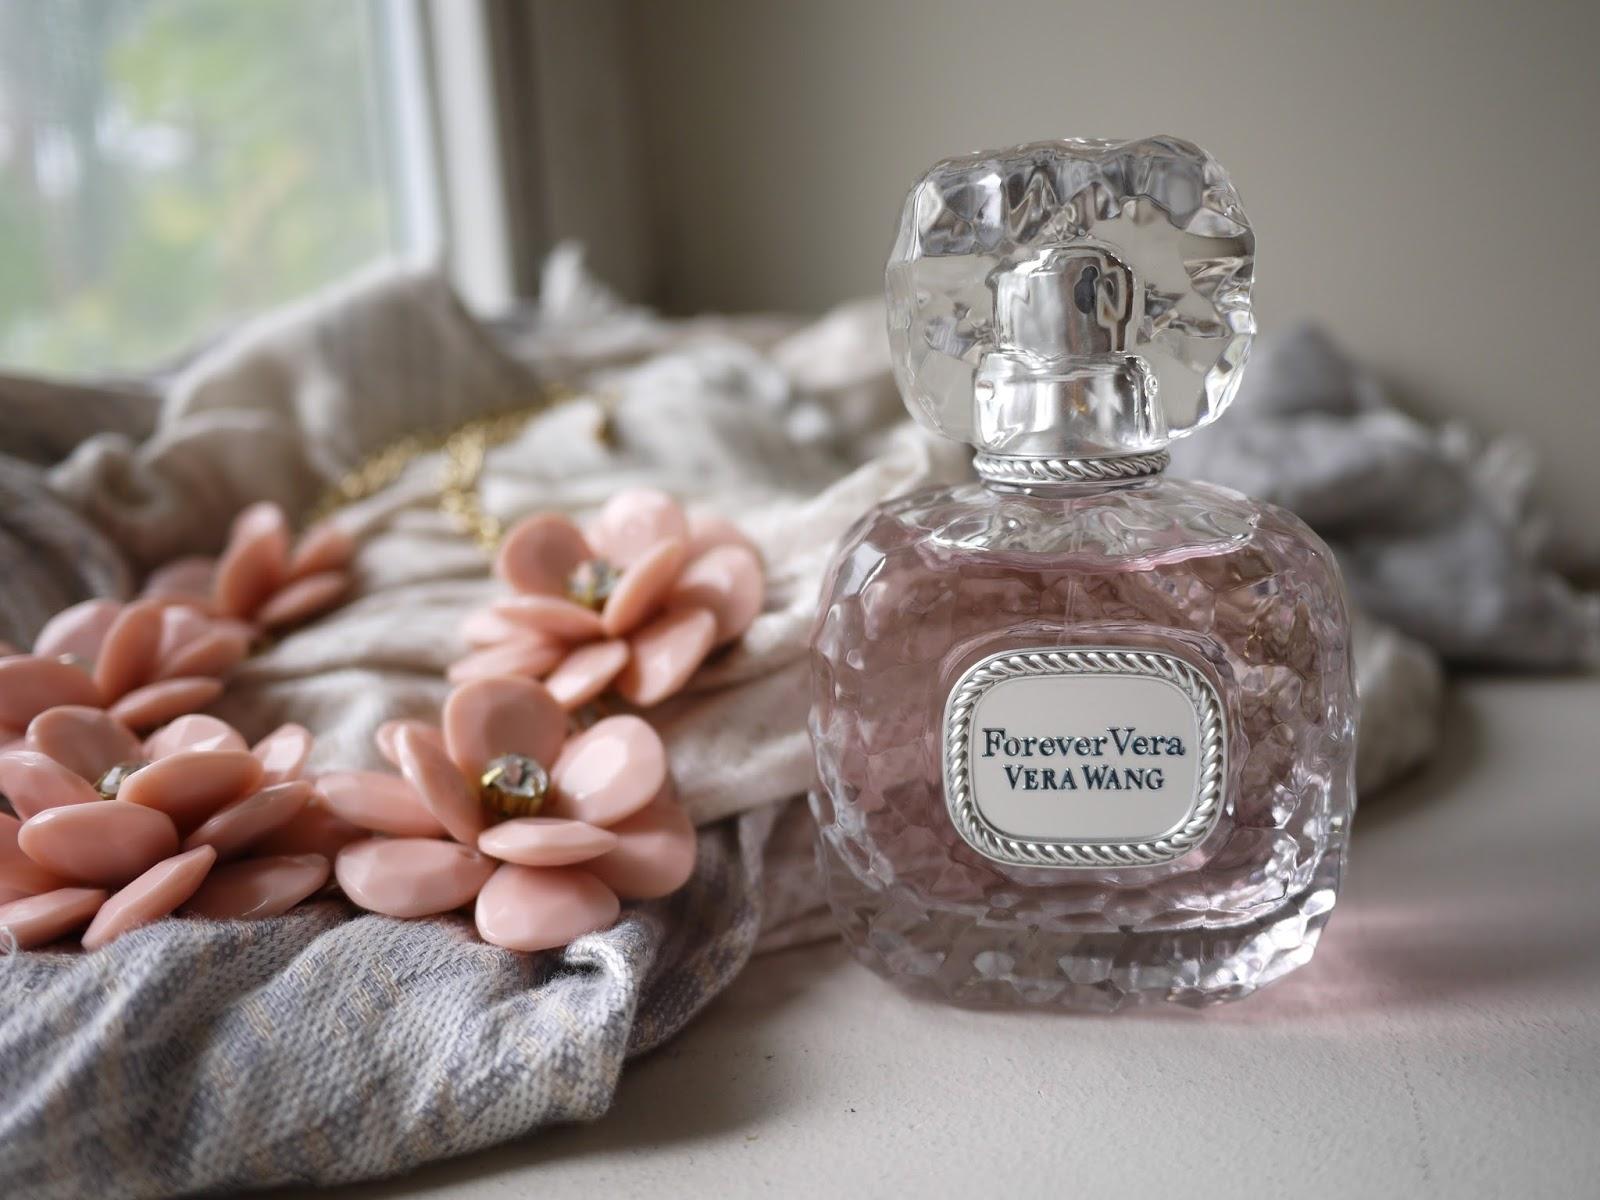 Vera Wang Forever Vera Perfume review